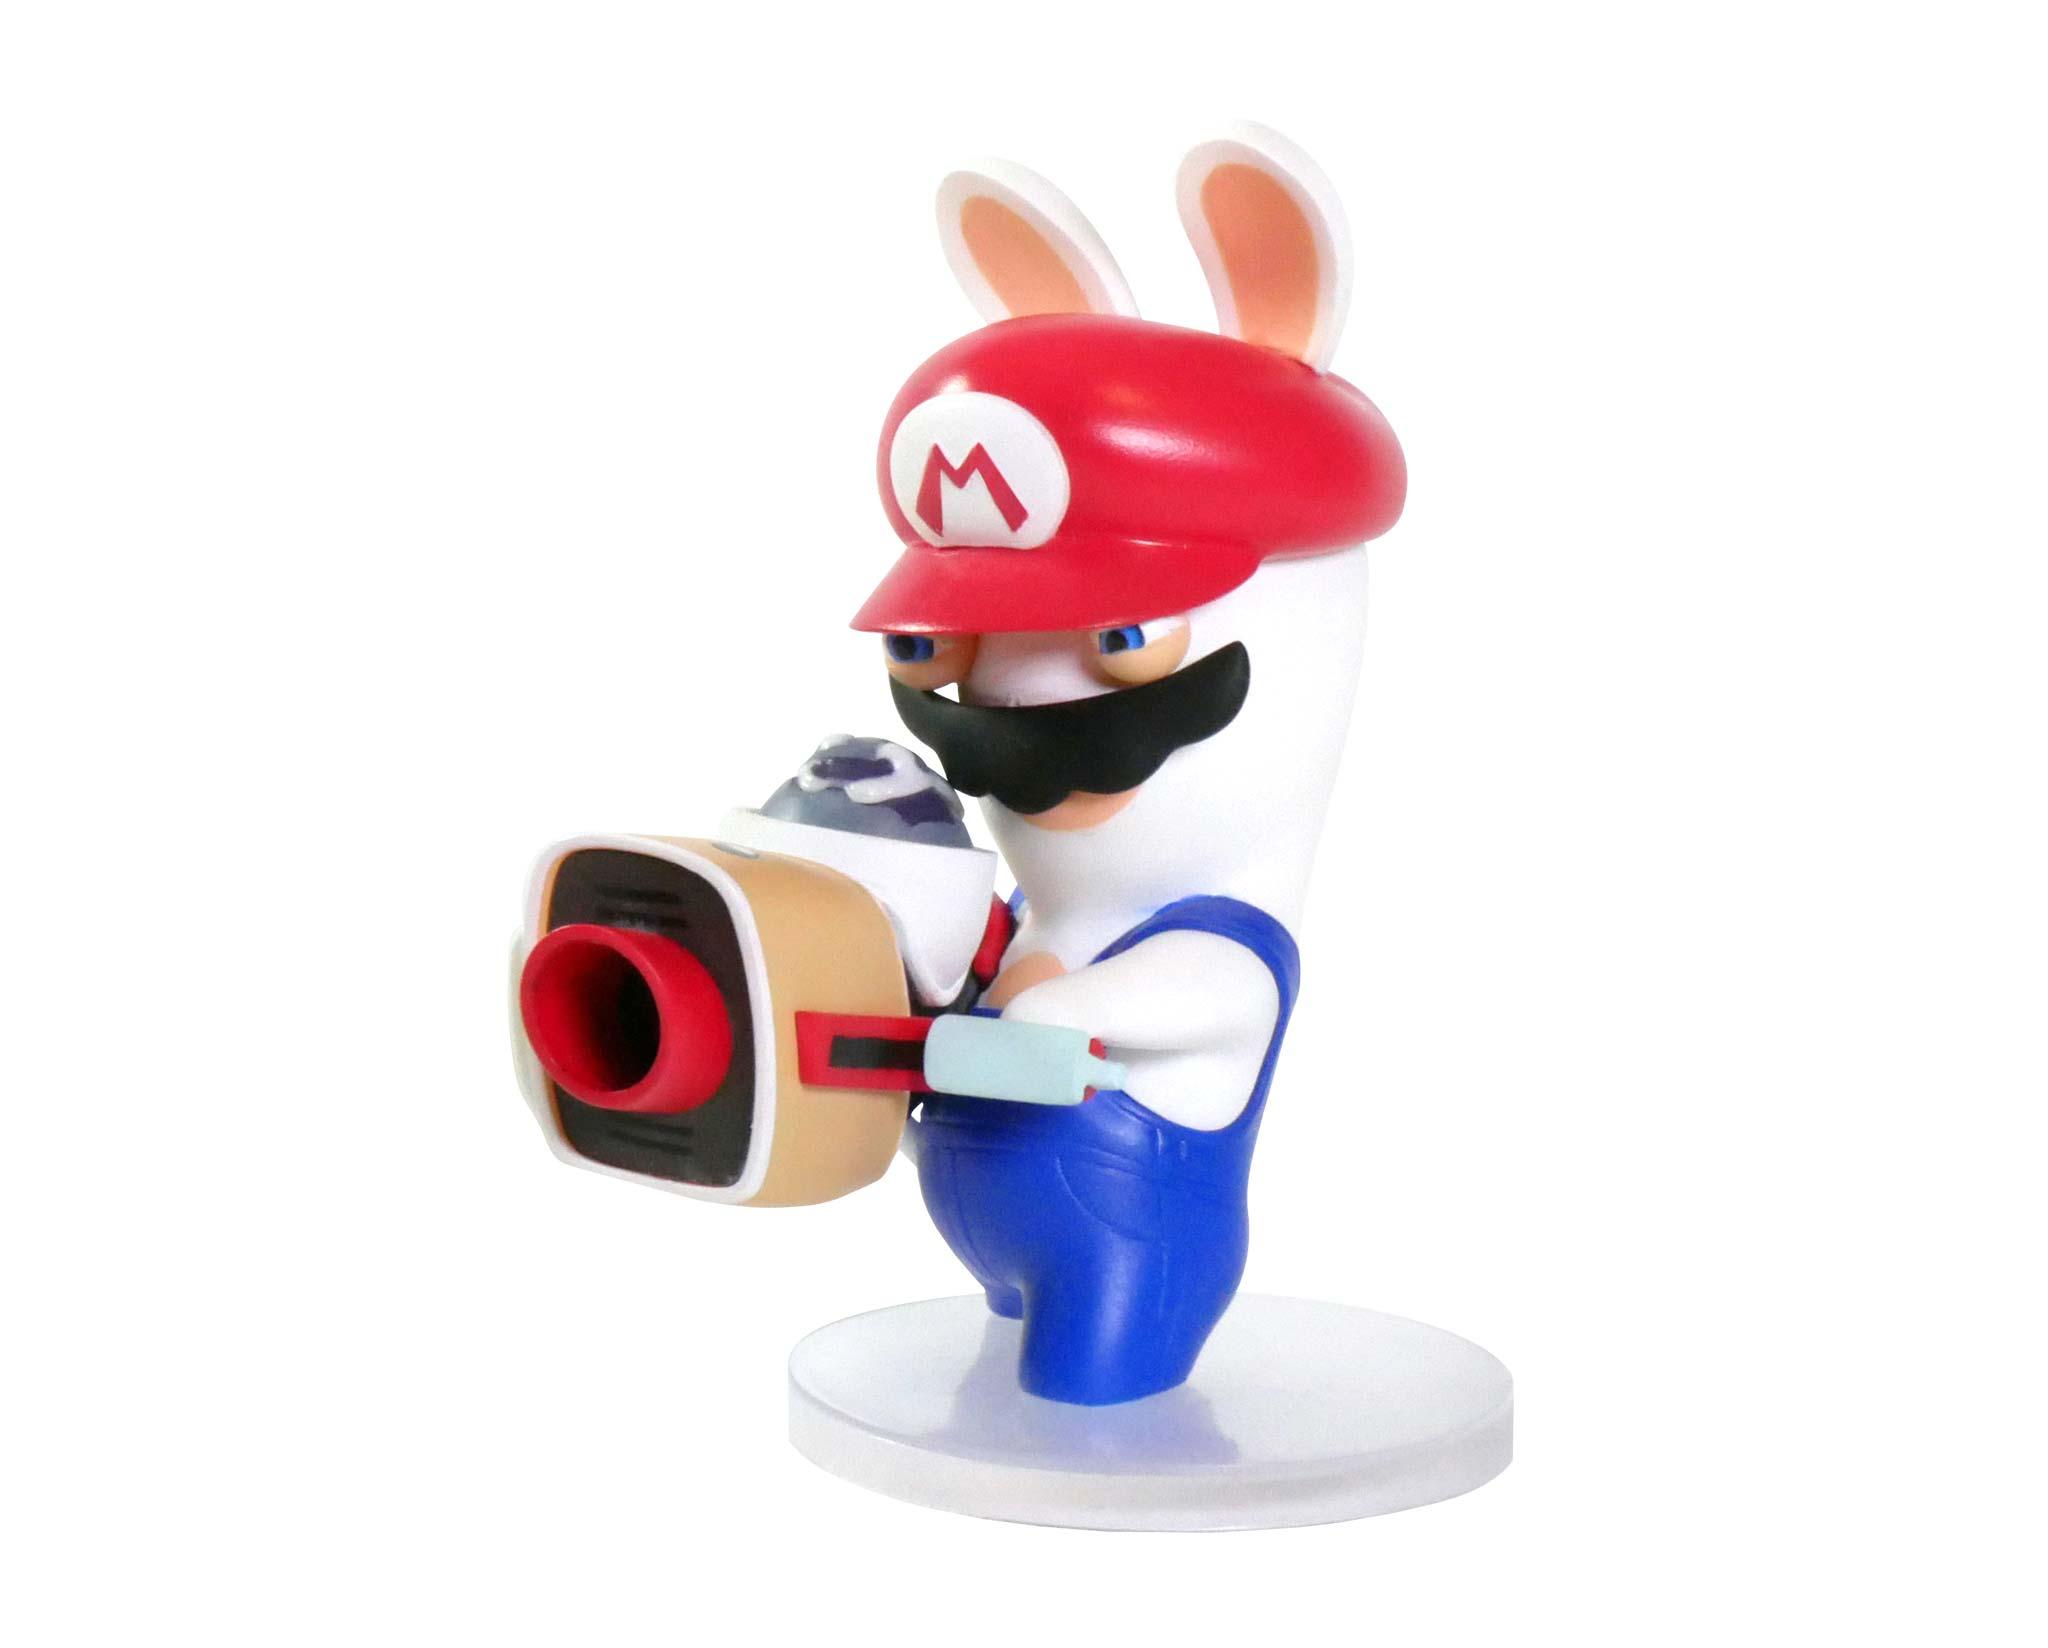 Ubisoft Store Will Be Selling Mario Rabbids Kingdom